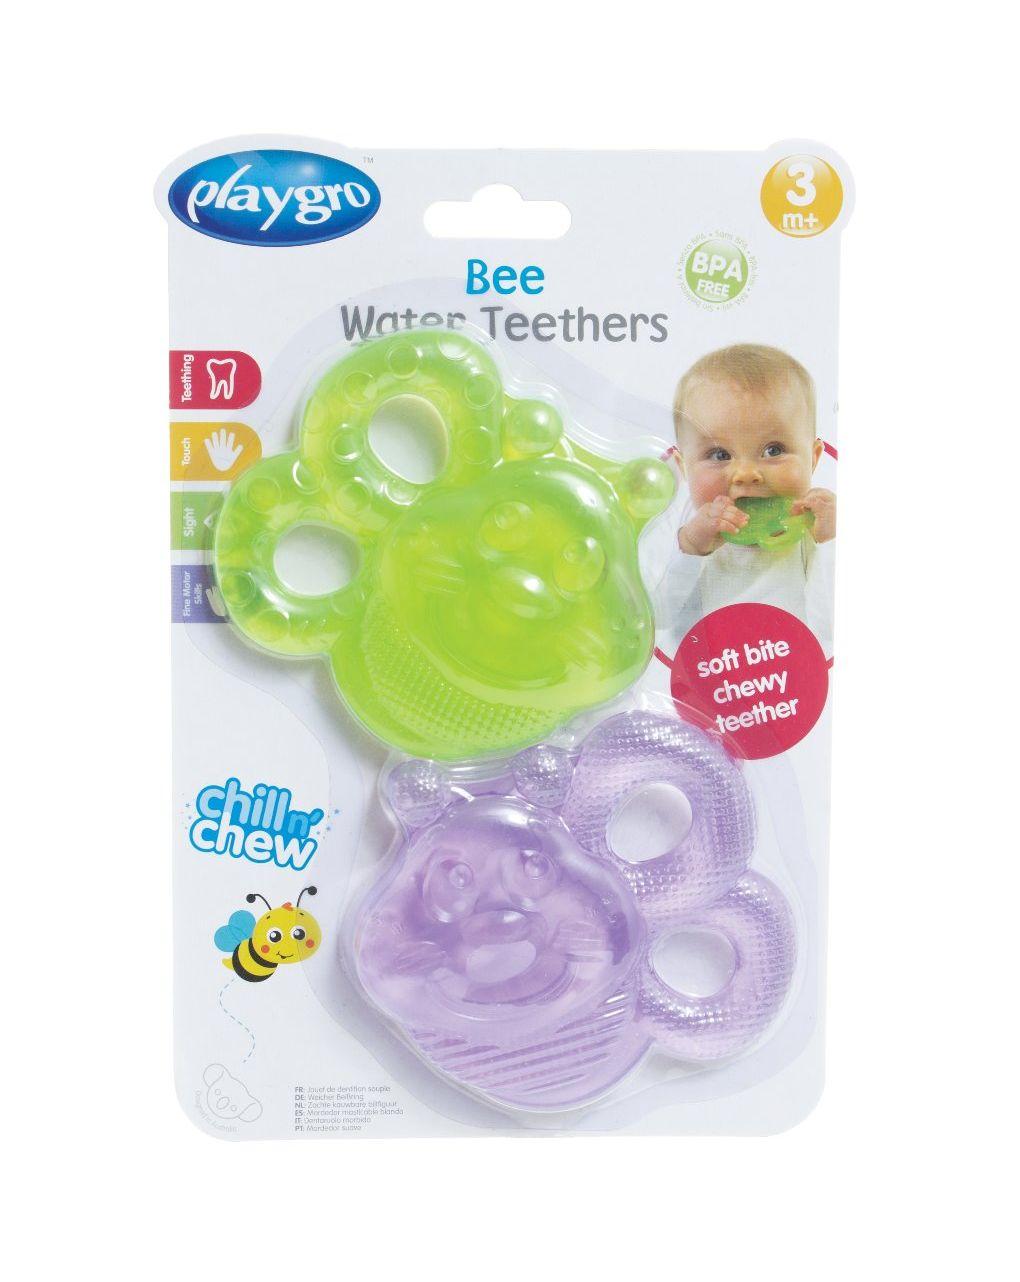 Water teether bee 2 pack - Playgro